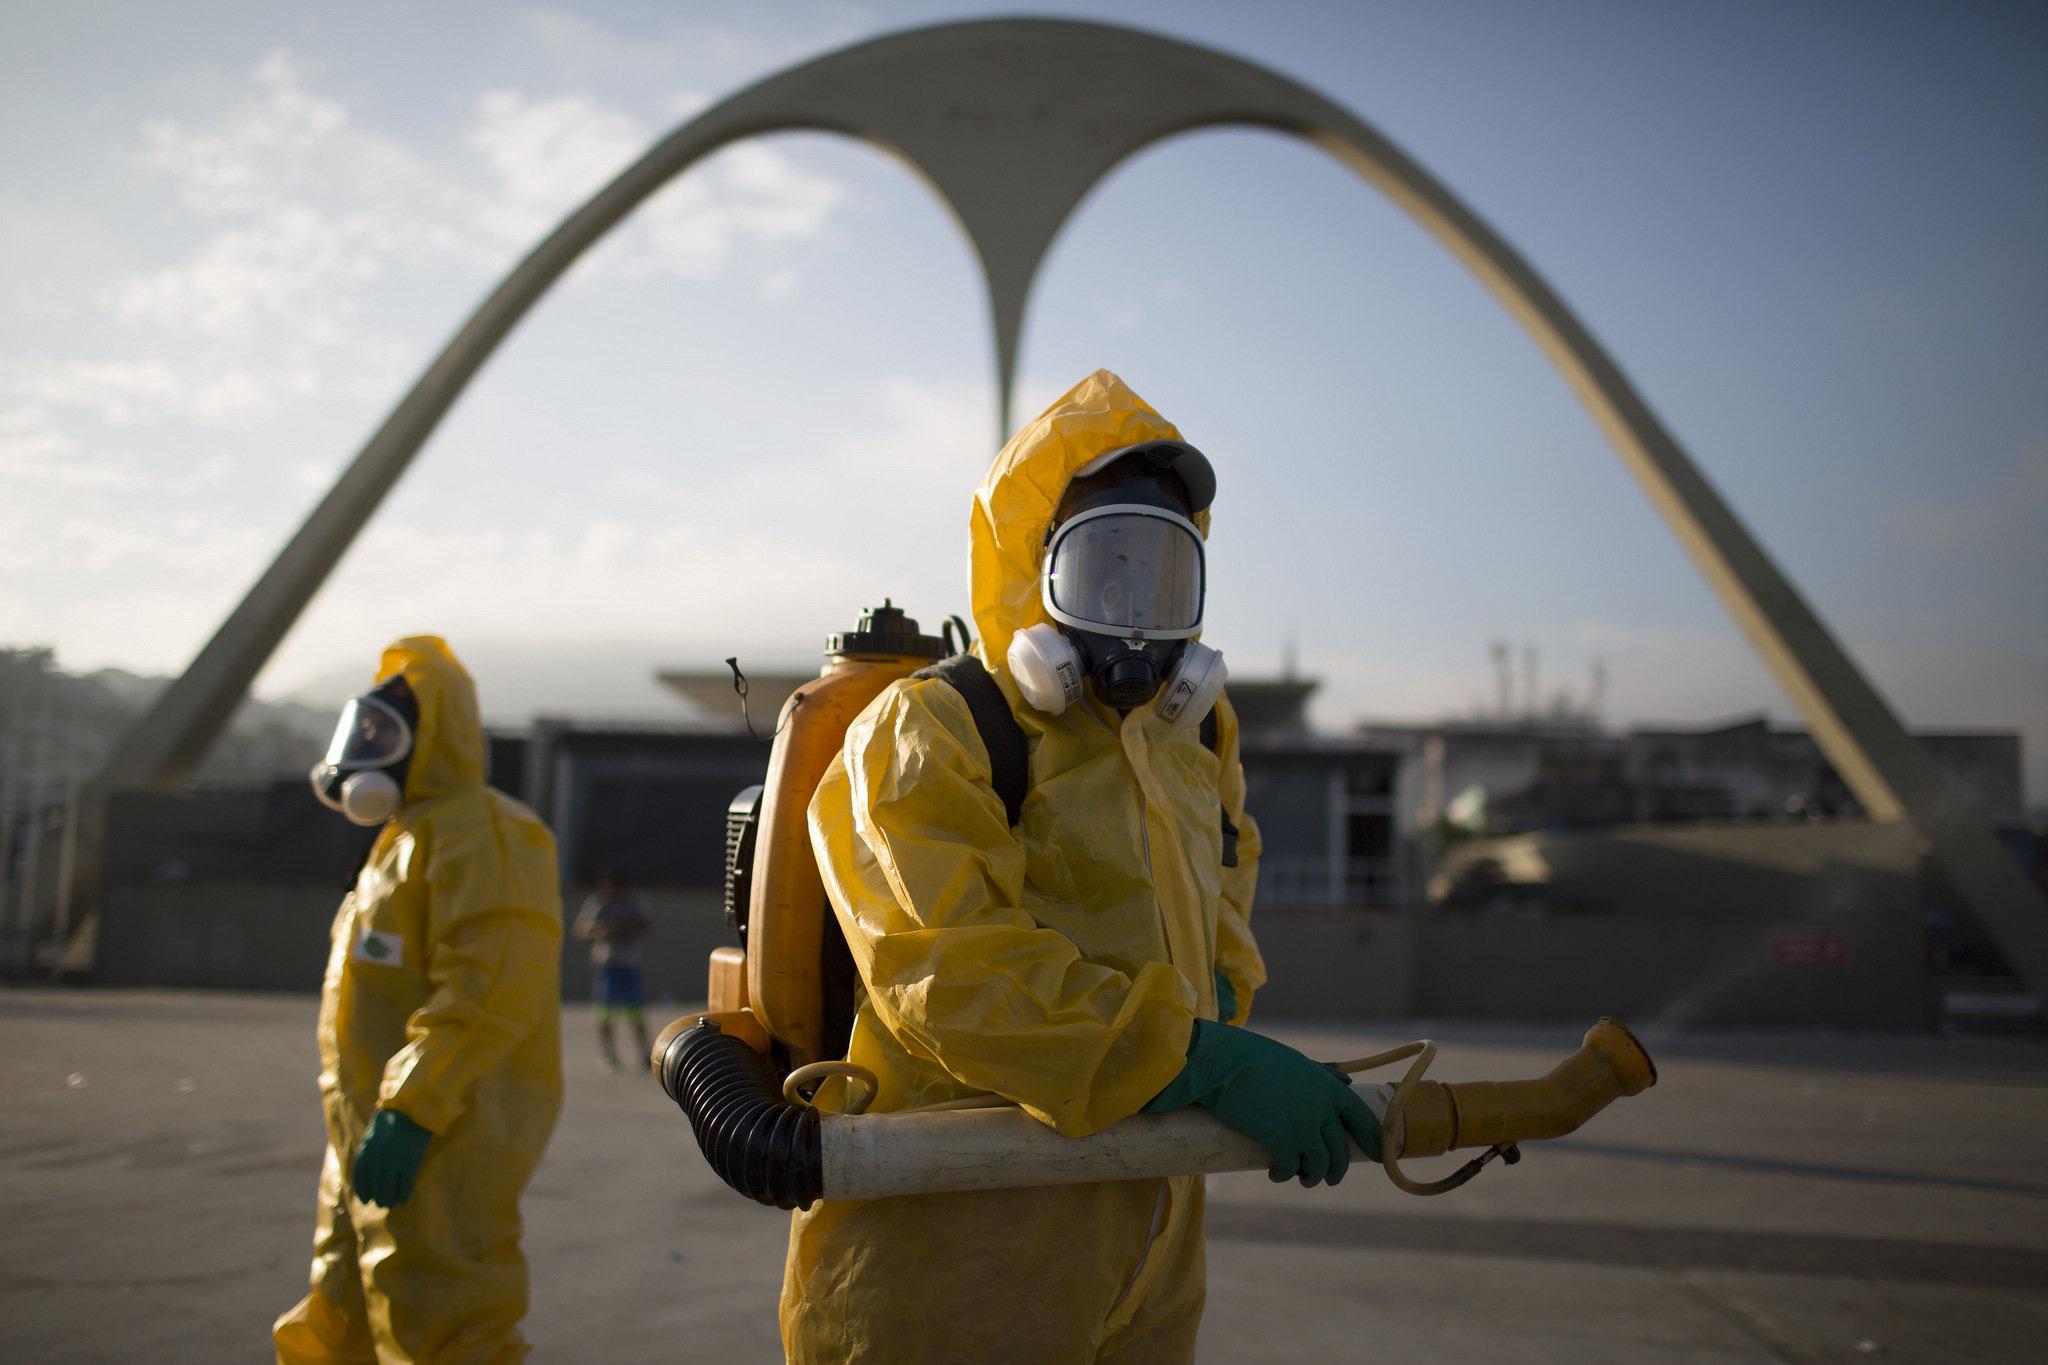 Zika virus: Health department confirms 3 cases in D.C.